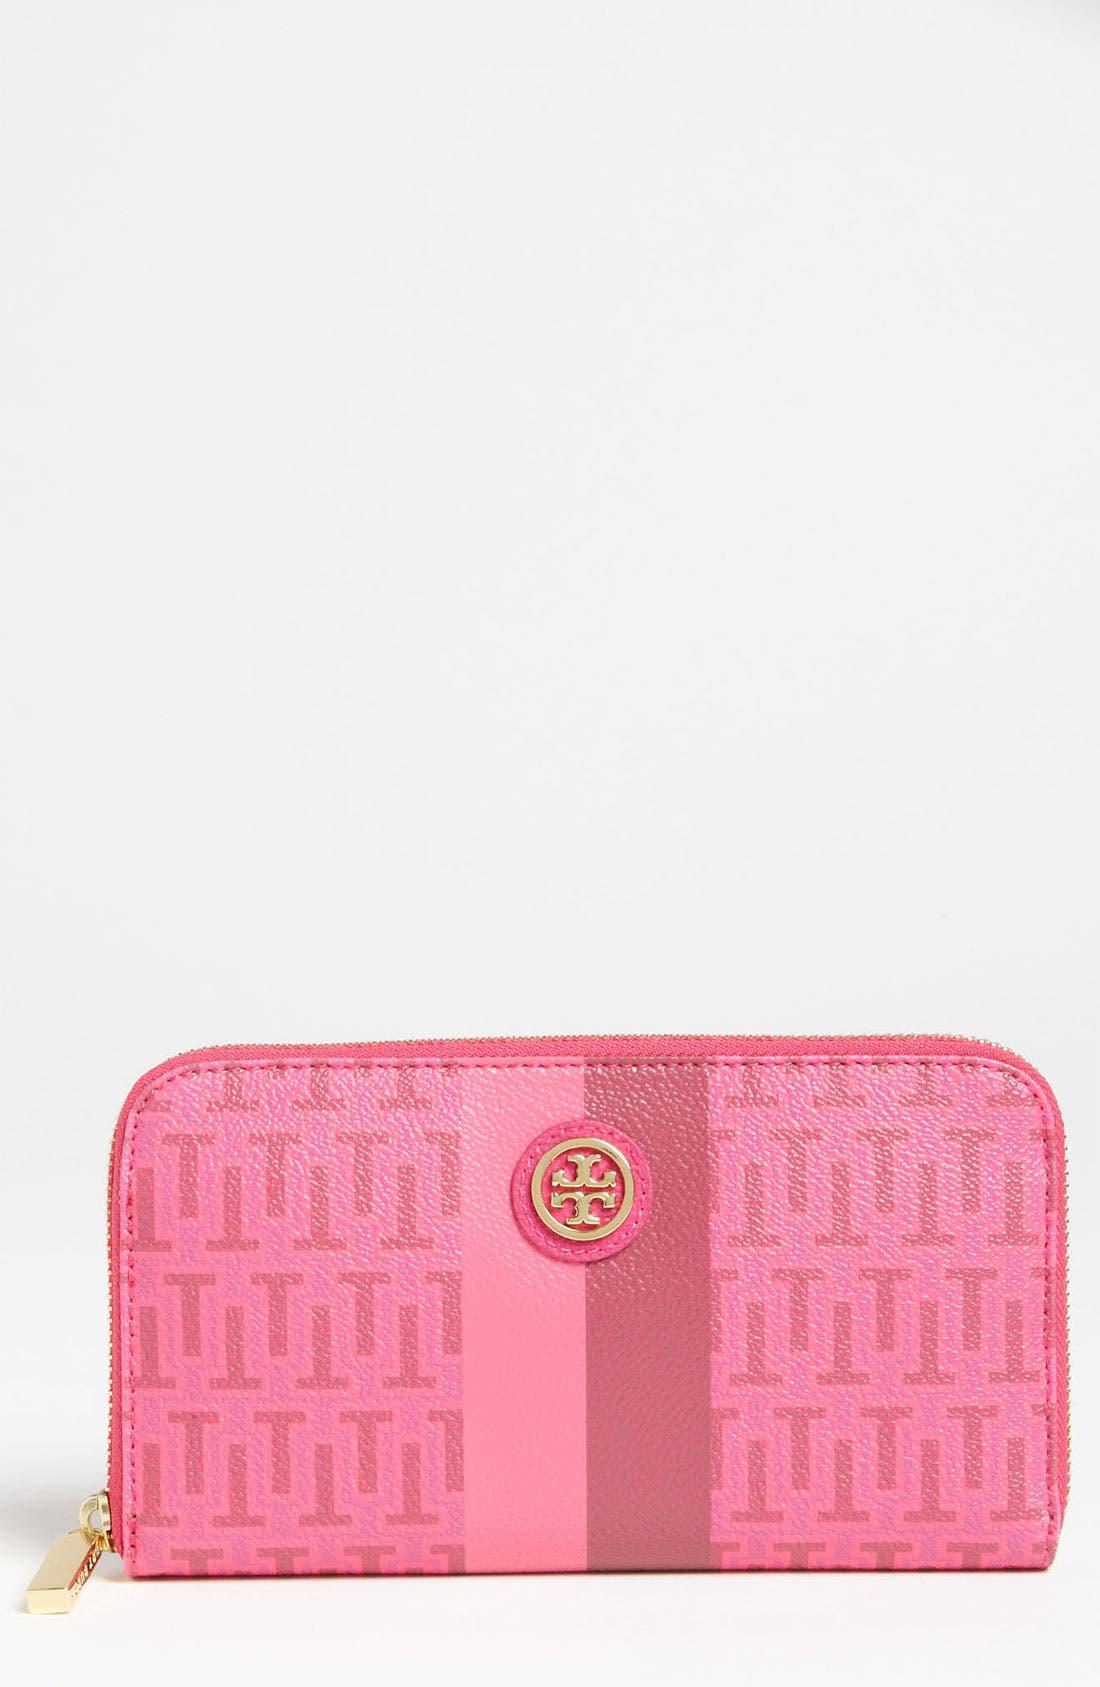 Alternate Image 1 Selected - Tory Burch 'Roslyn' Continental Zip Wallet